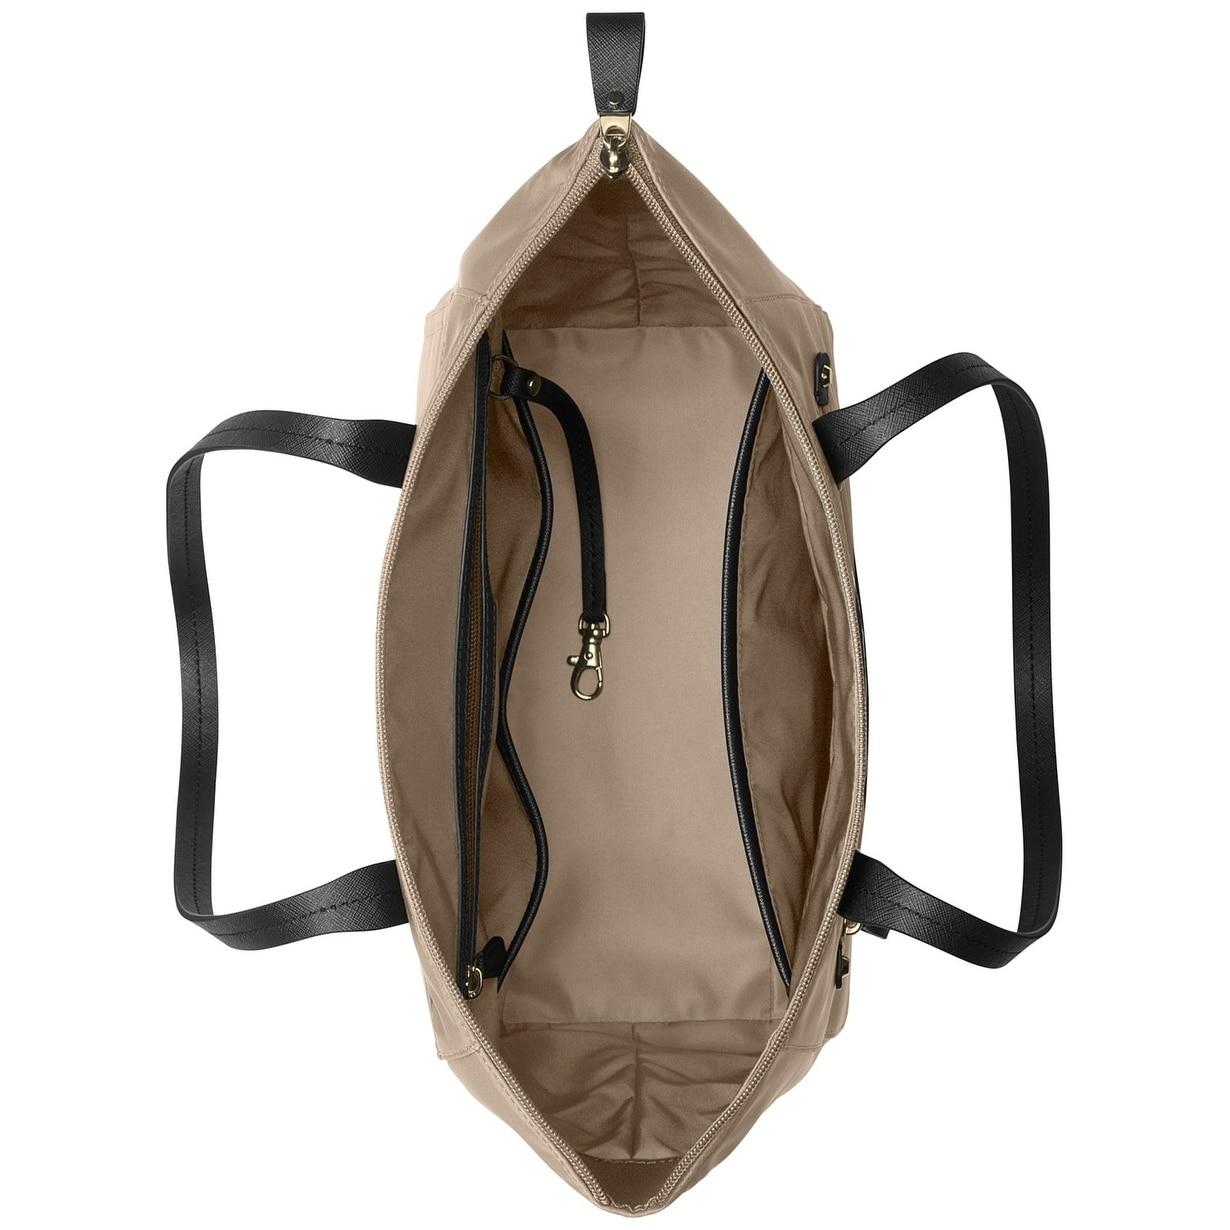 4cfd1ba59367 Shop MICHAEL Michael Kors Kelsey Medium Top-Zip Tote Truffle - Free  Shipping Today - Overstock - 22161711